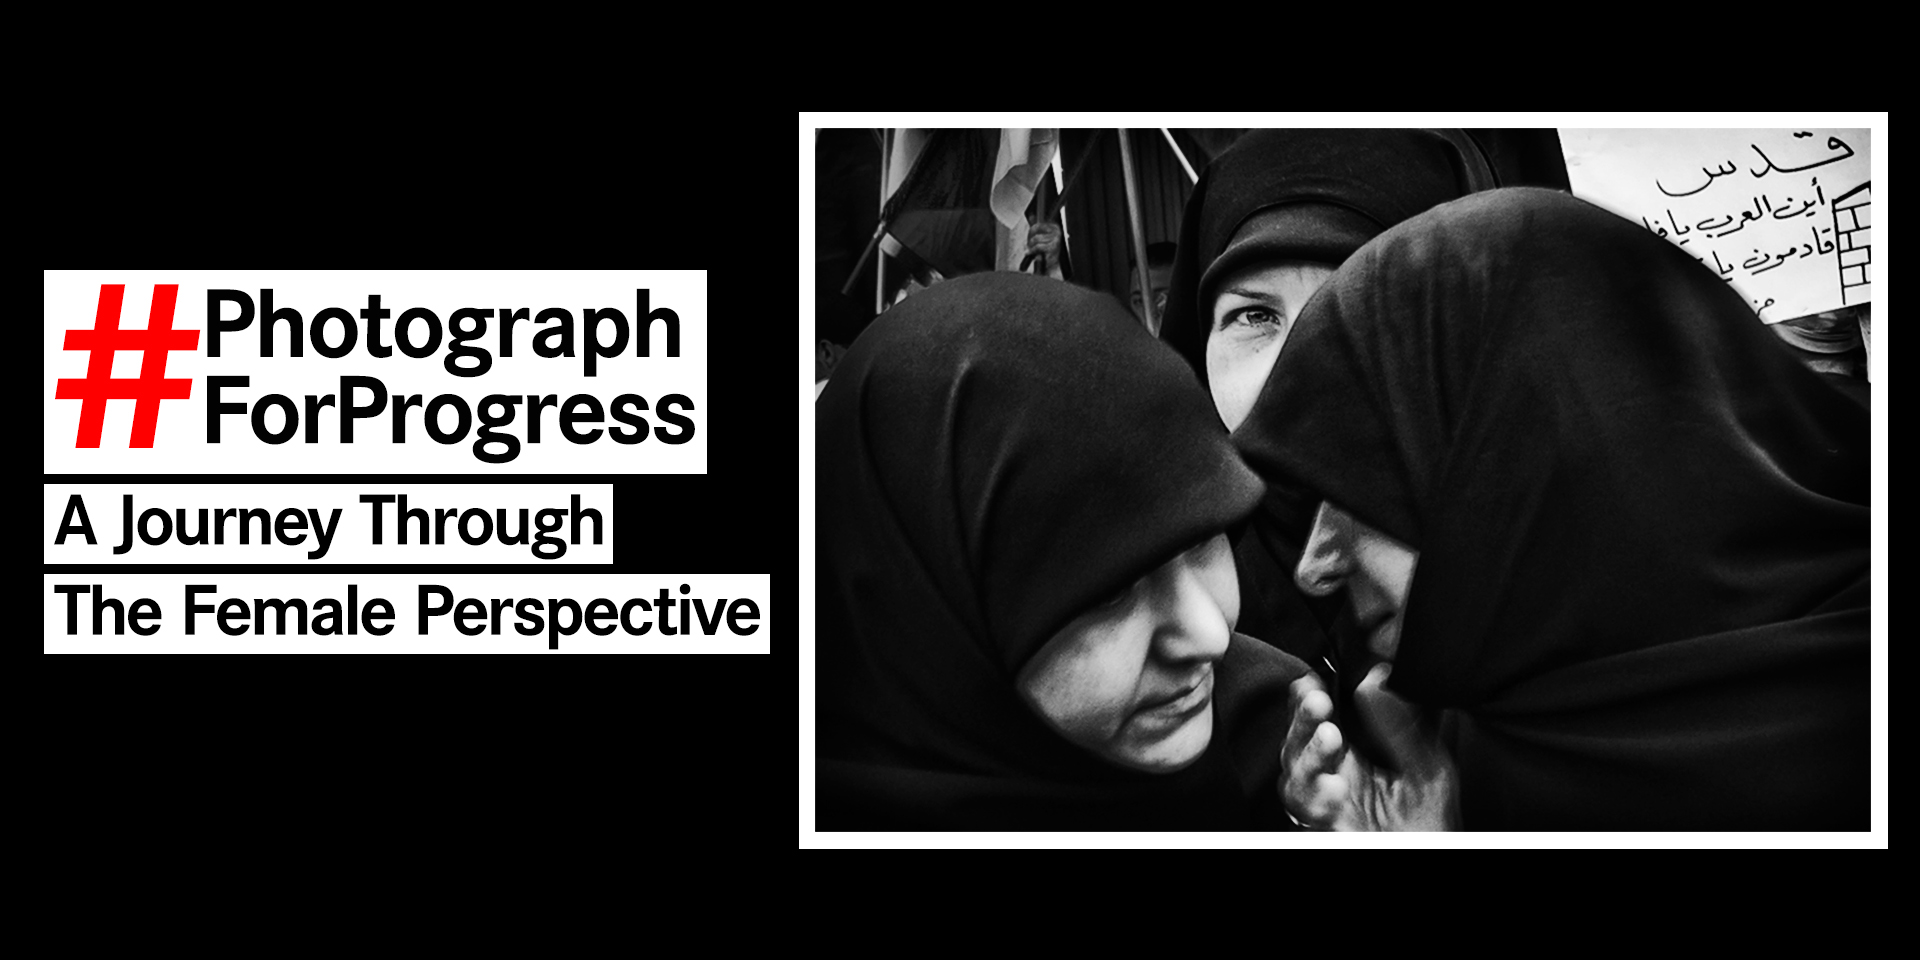 #PHOTOGRAPHFORPROGRESS OPENING RECEPTION & ARTIST FORUM